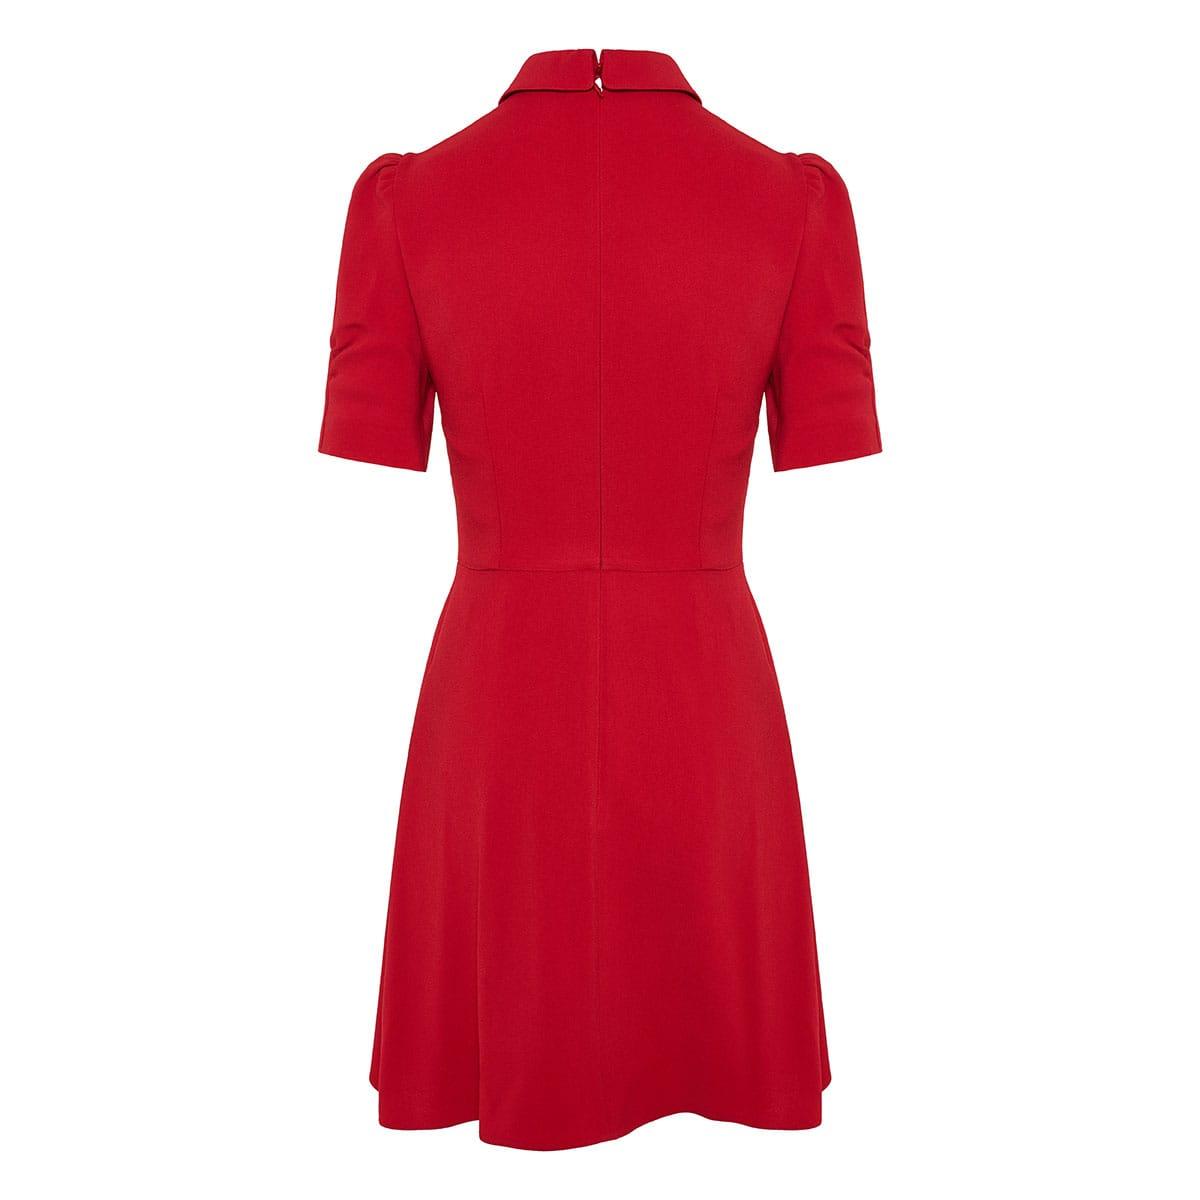 Puff-sleeved mini dress